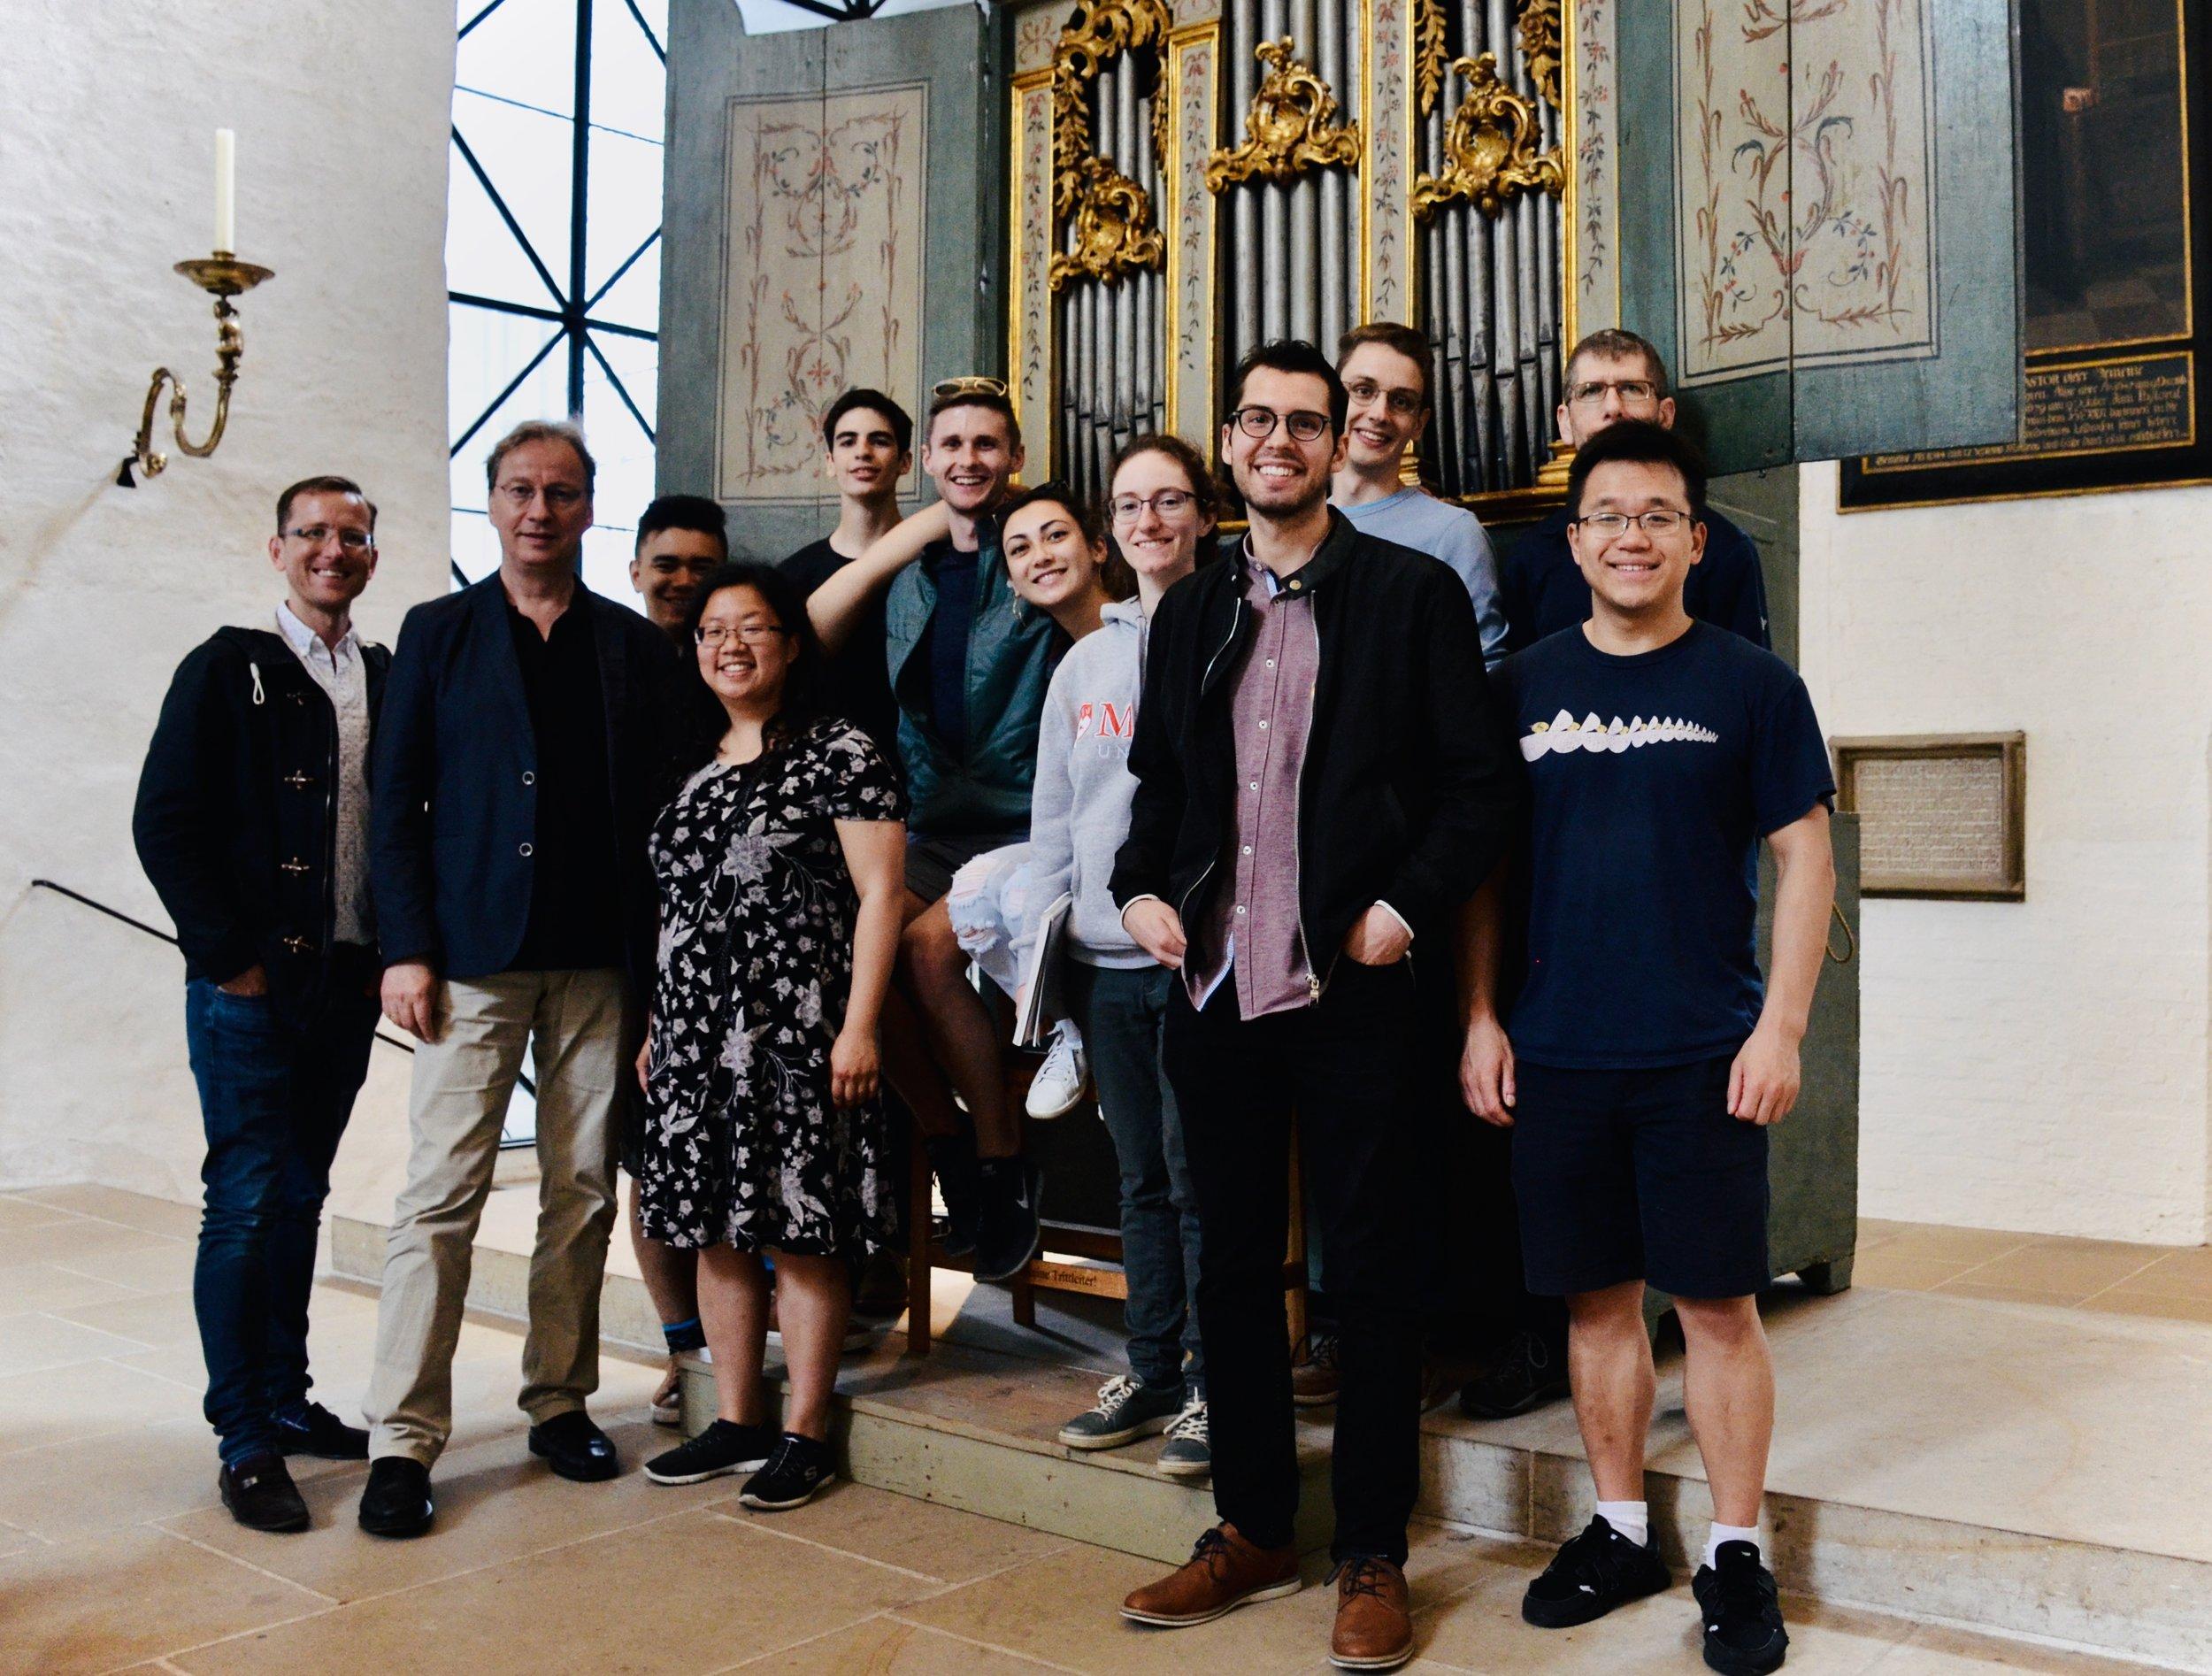 Members of Boston Organ Studio with Prof. Arvid Gast in Lübeck Dom.